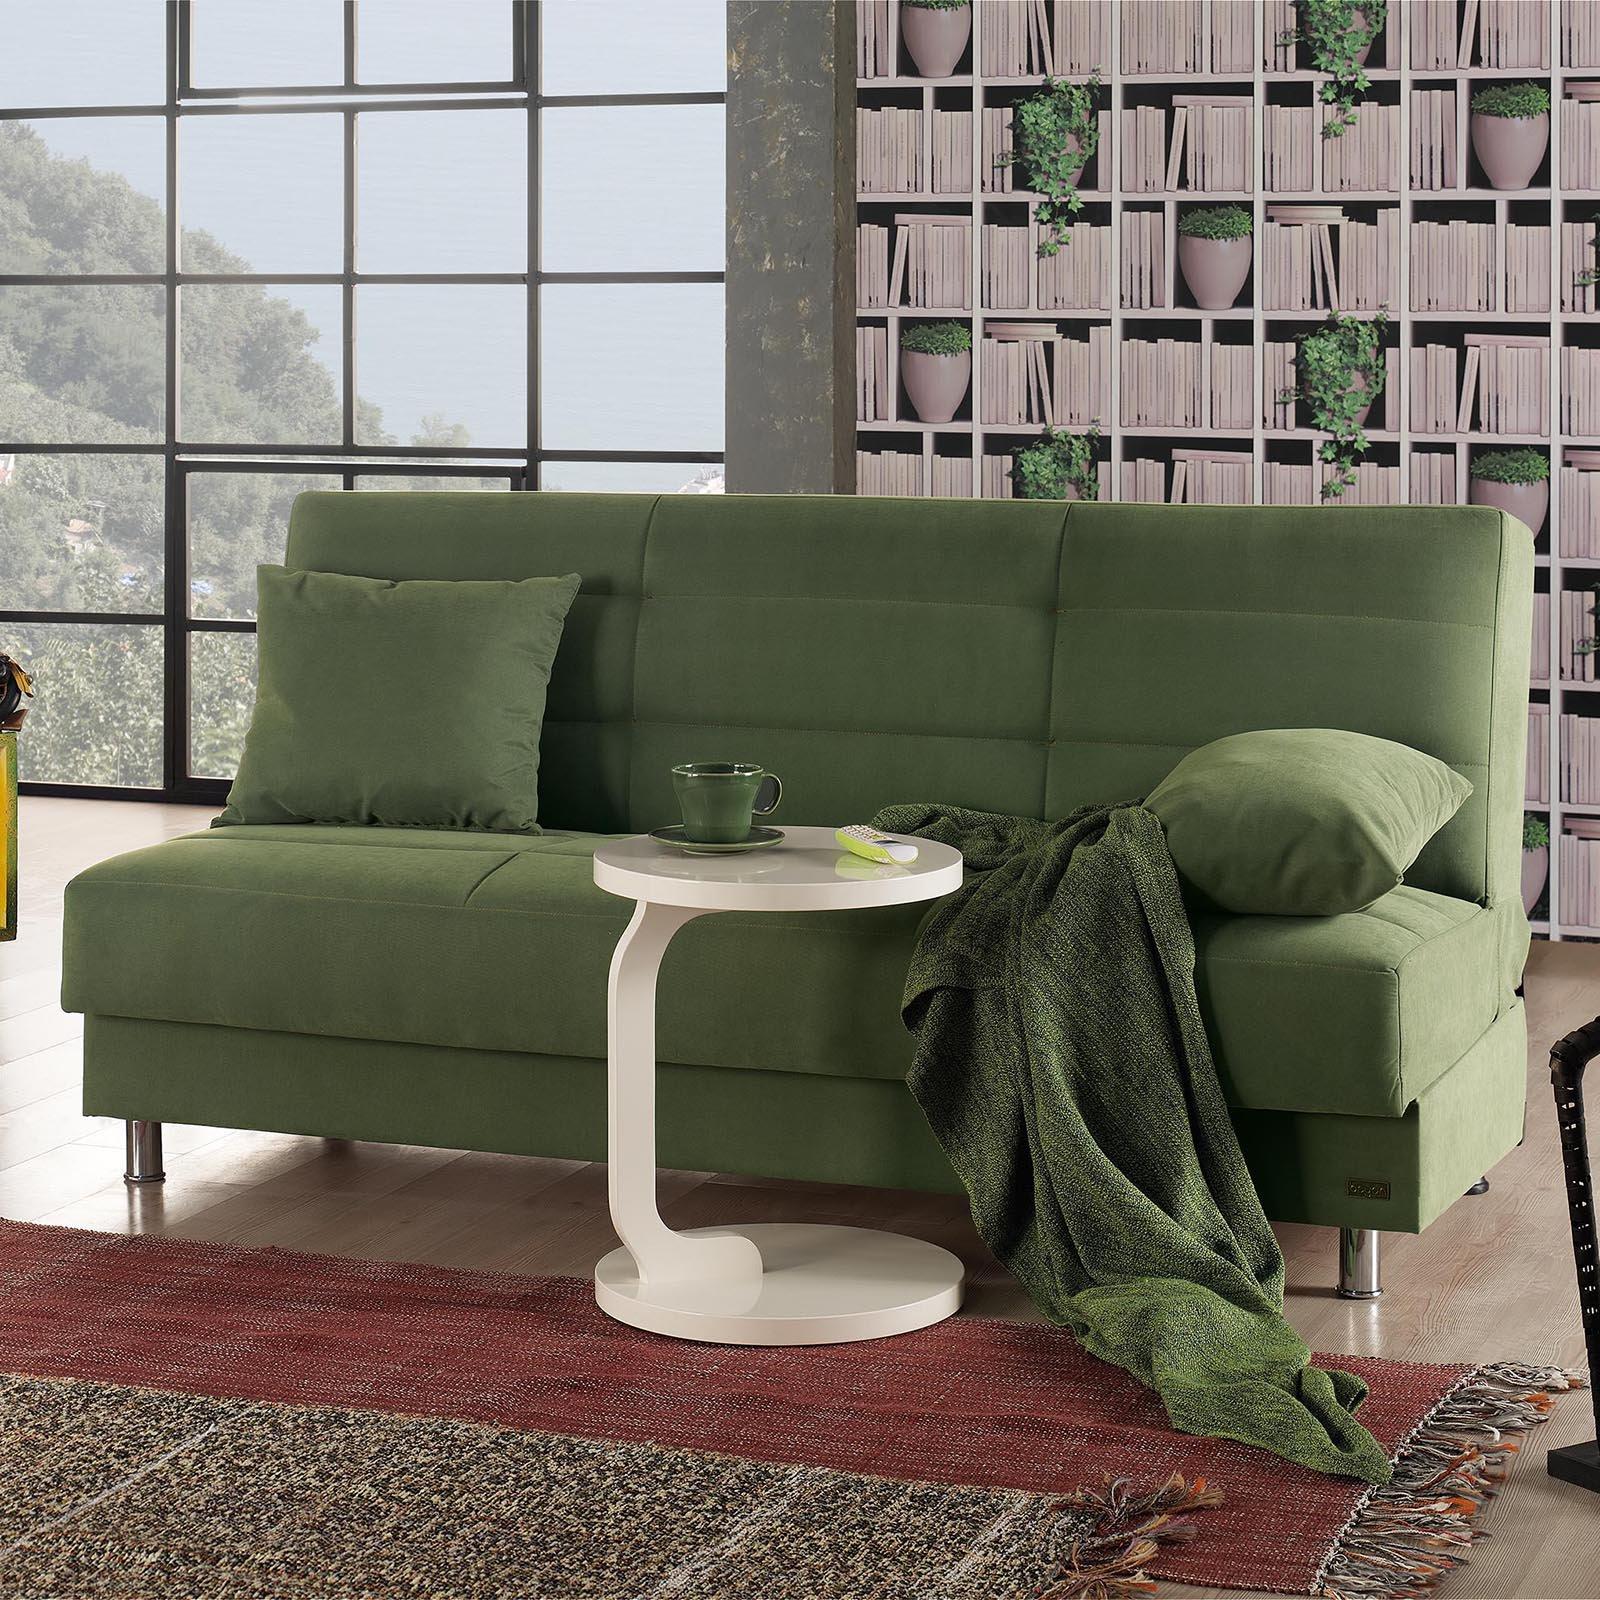 Empire furniture usa atlanta armless modern convertible sofa walmart com